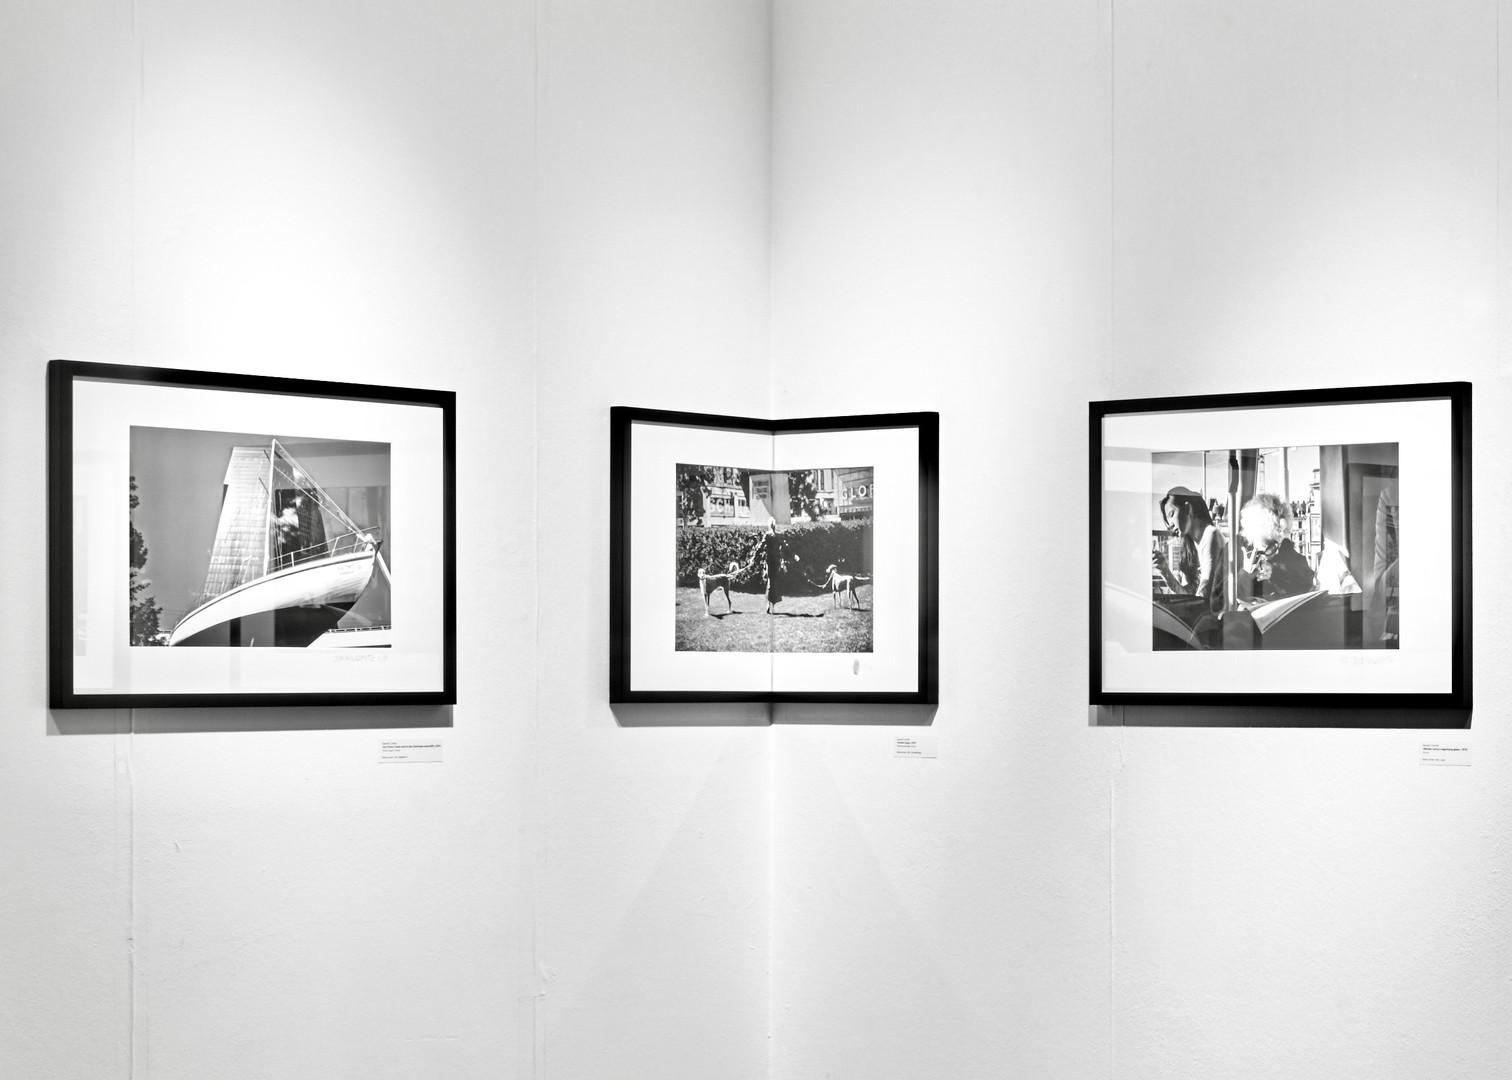 007_Ausstellung_15.jpg